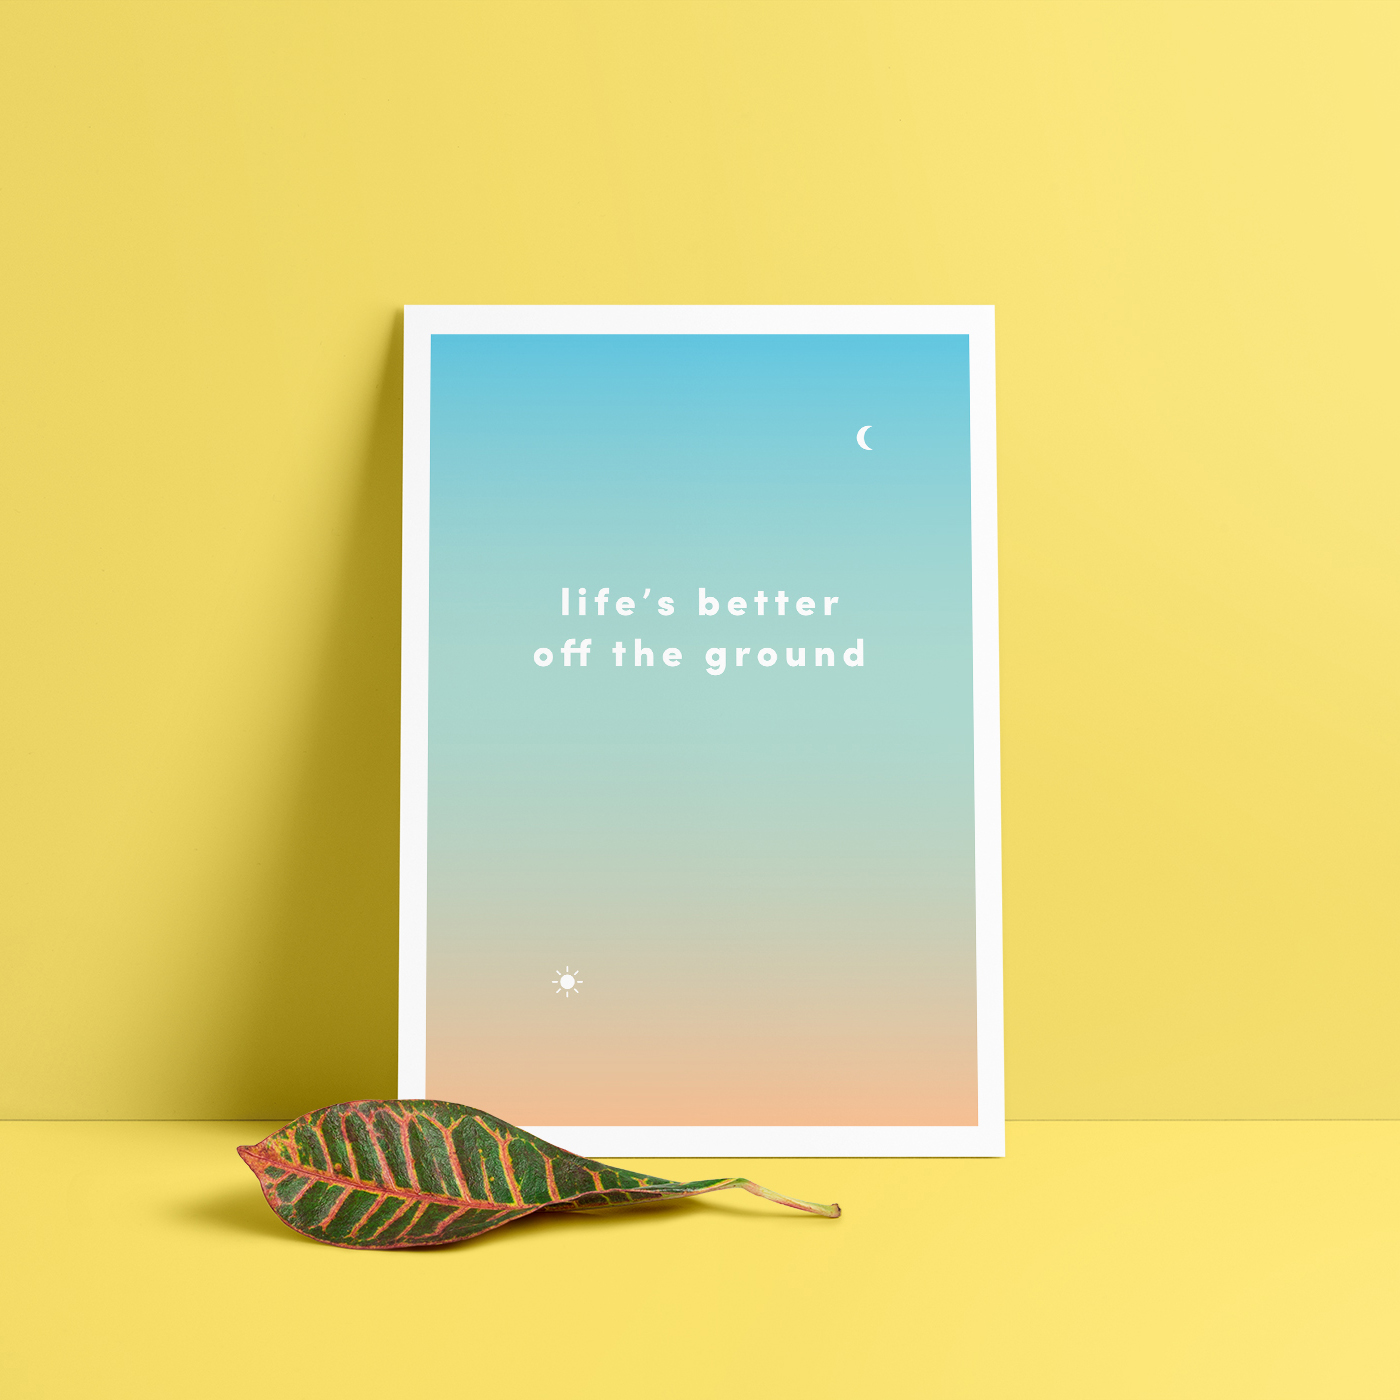 Poster-MockUp-Vert-and-Horiz_v5_02_LifesBetterOffTheGround.jpg